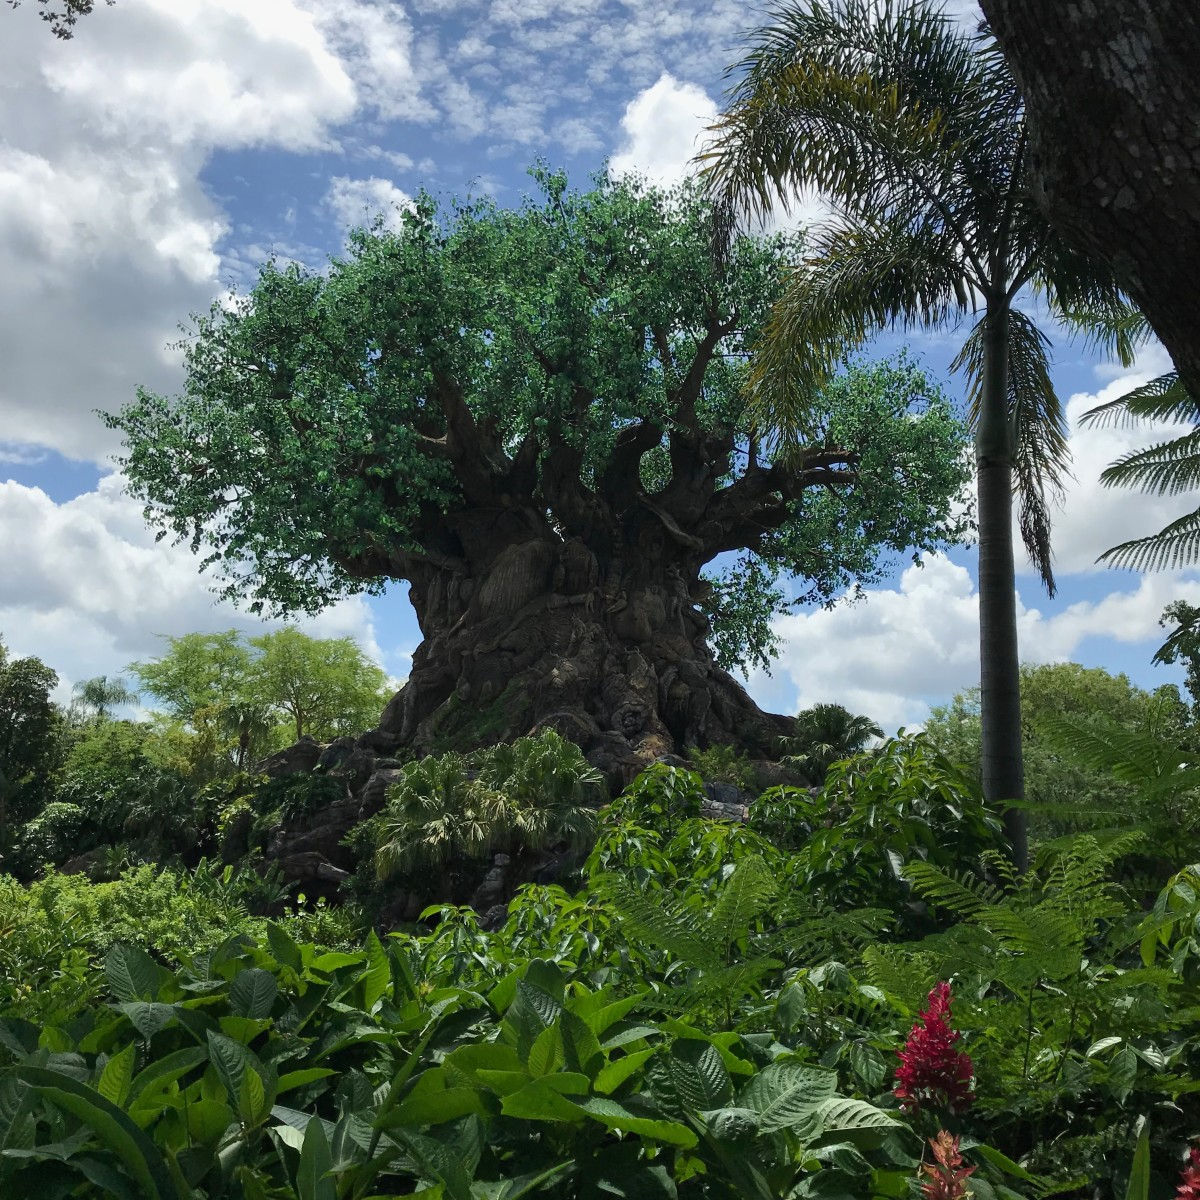 The Tree of Life centerpiece of Animal Kingdom.